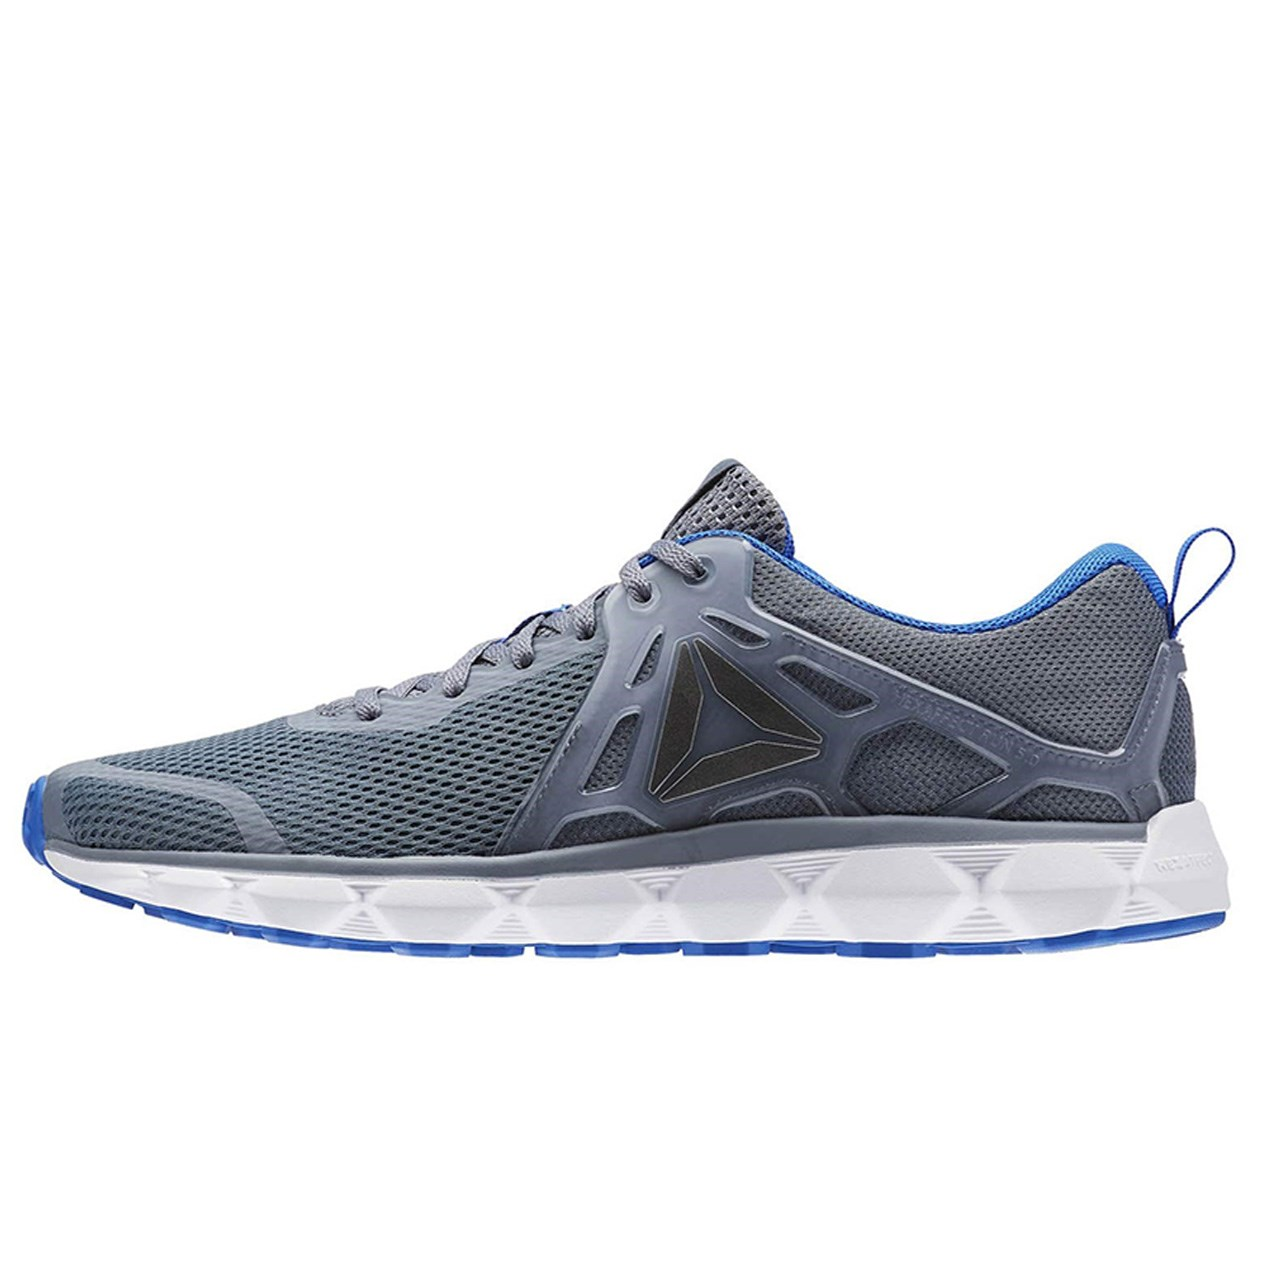 قیمت کفش مخصوص دویدن مردانه ریباک مدل Hexaffect Run 5.0 Mtm